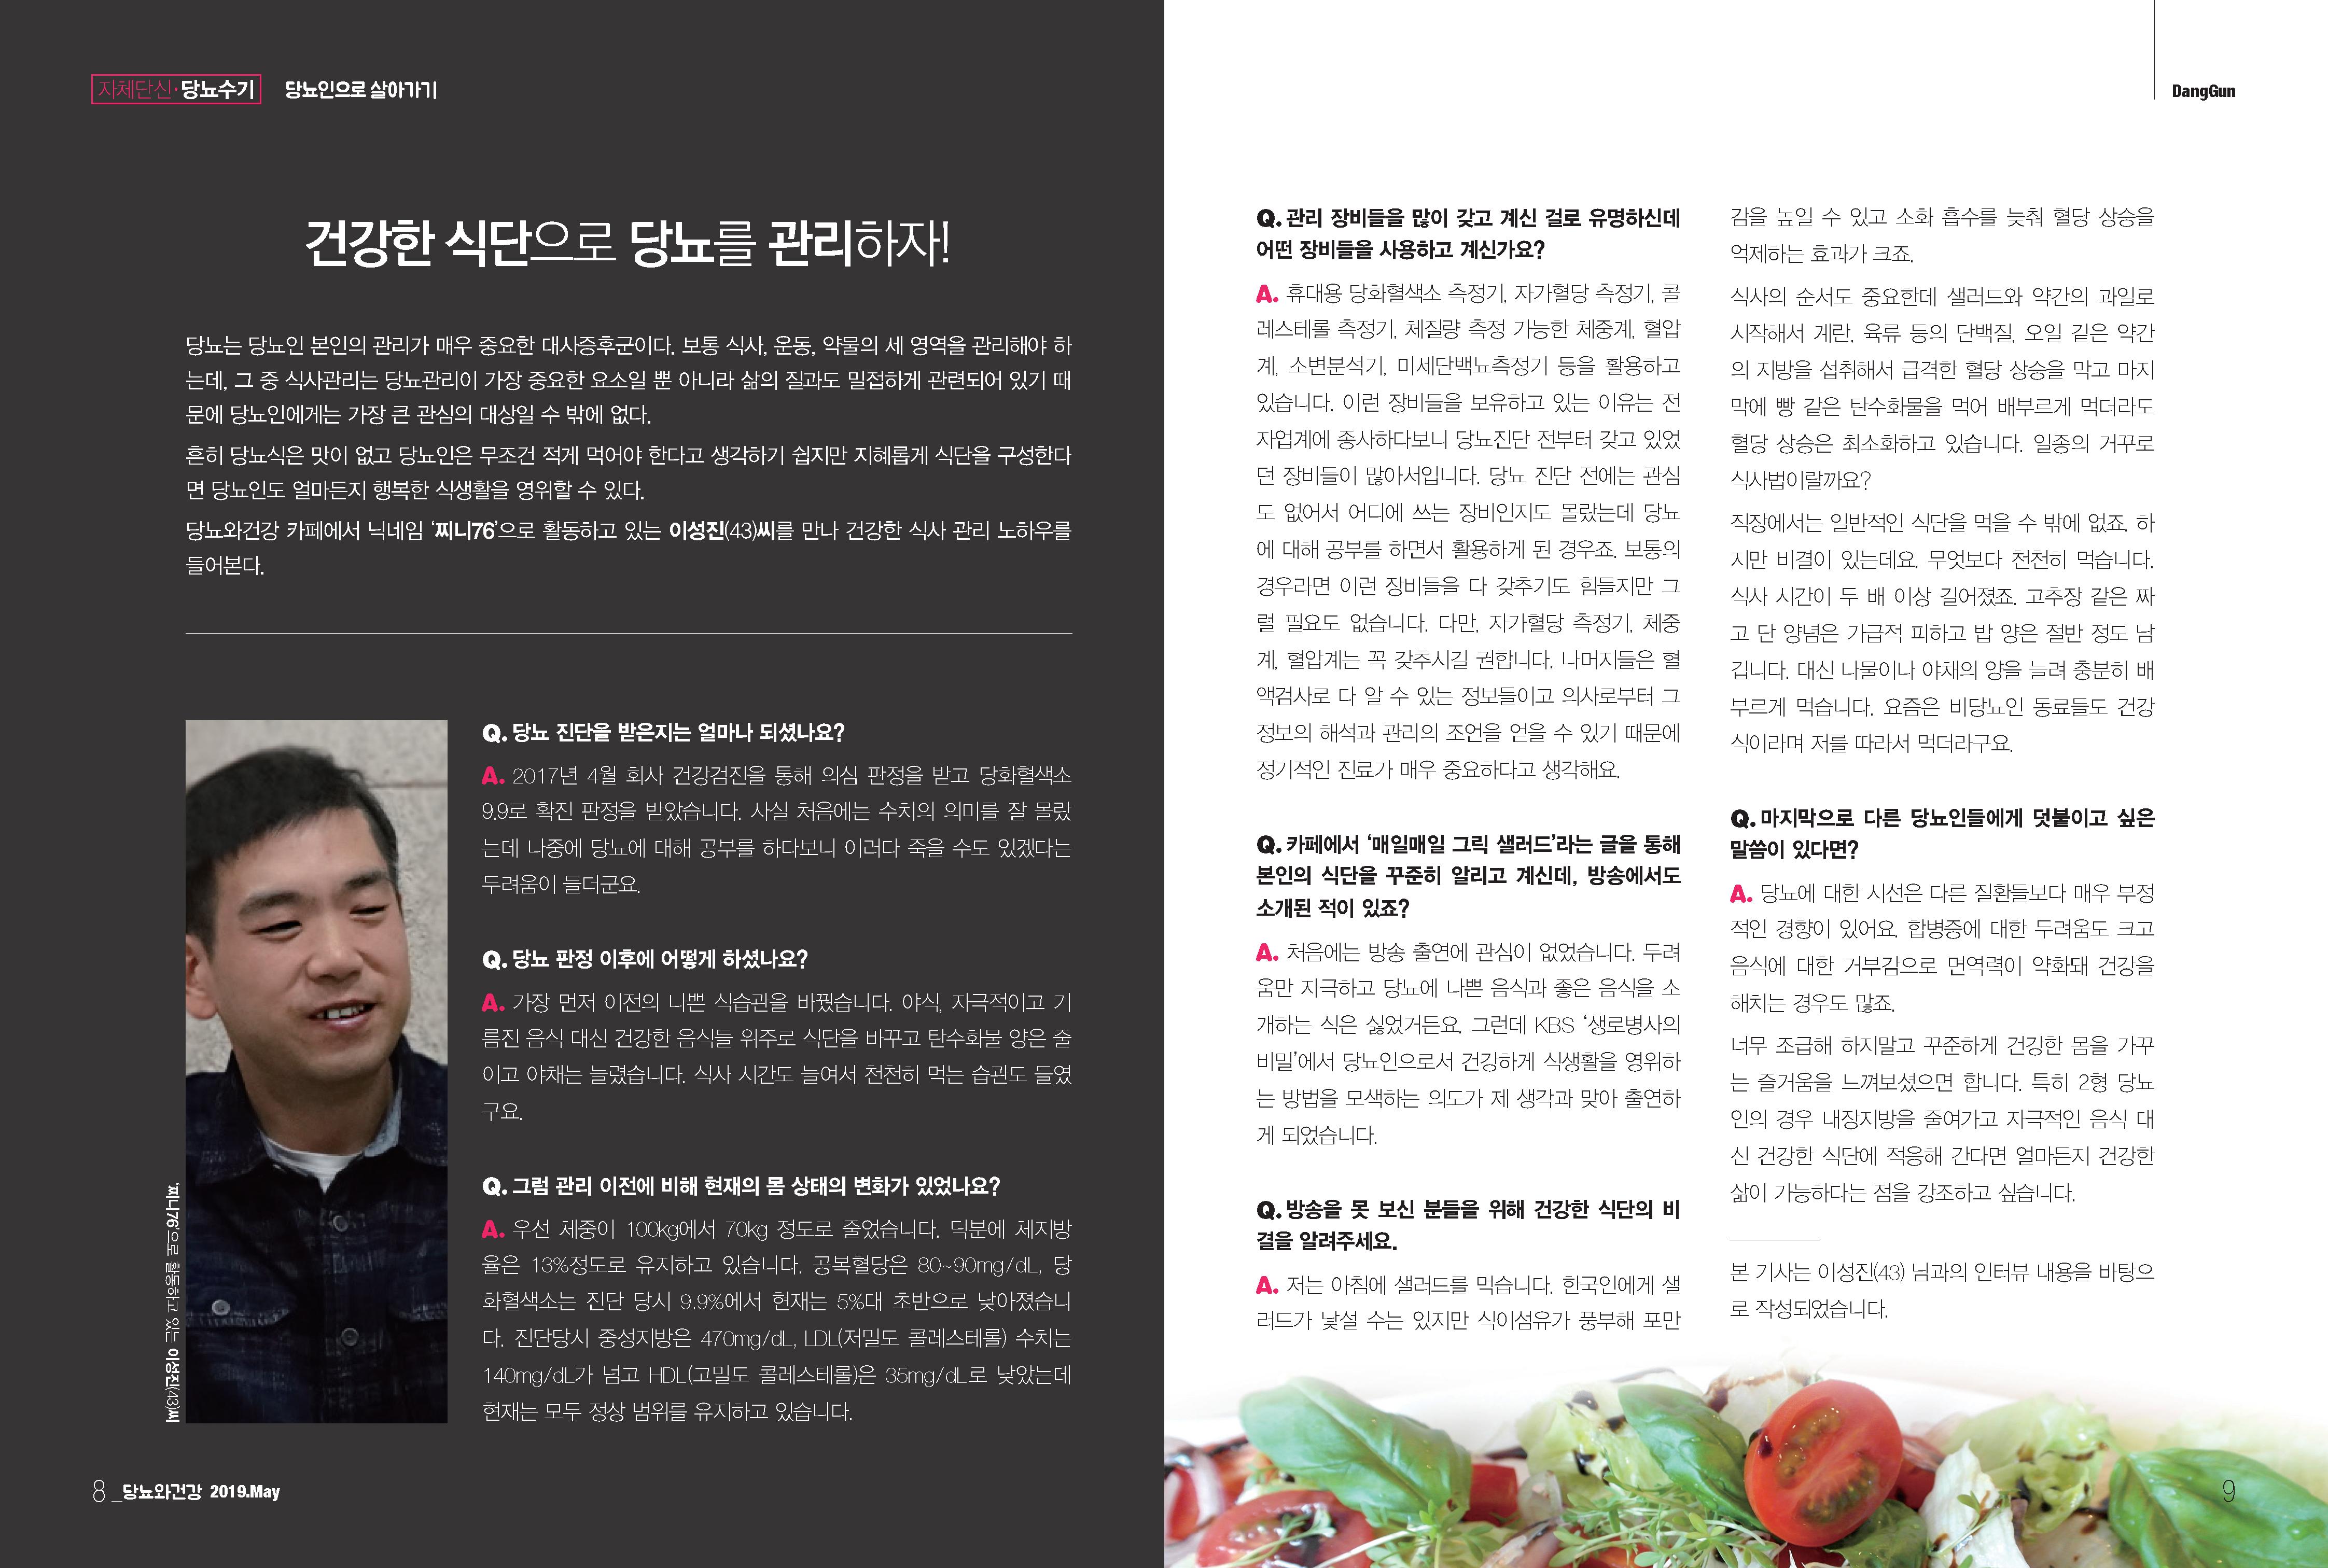 danggun_magazine_interview.png